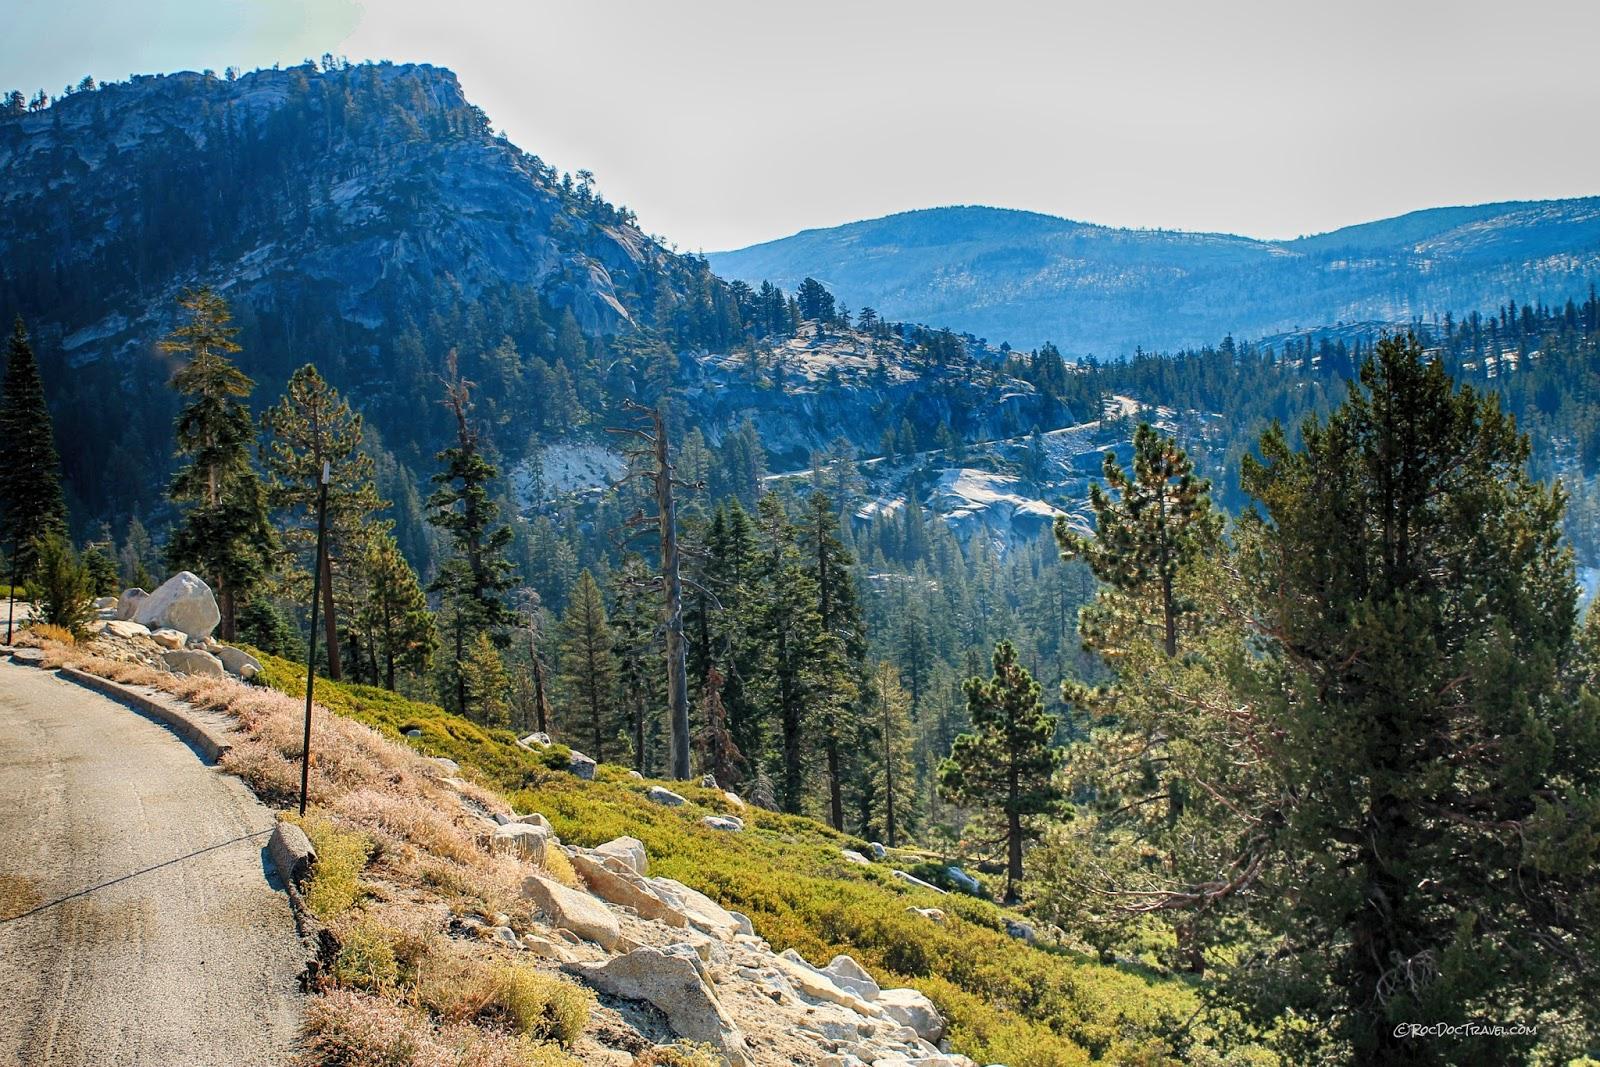 Yosemite National Park Tioga Pass geology travel field trip copyright rocdoctravel.com